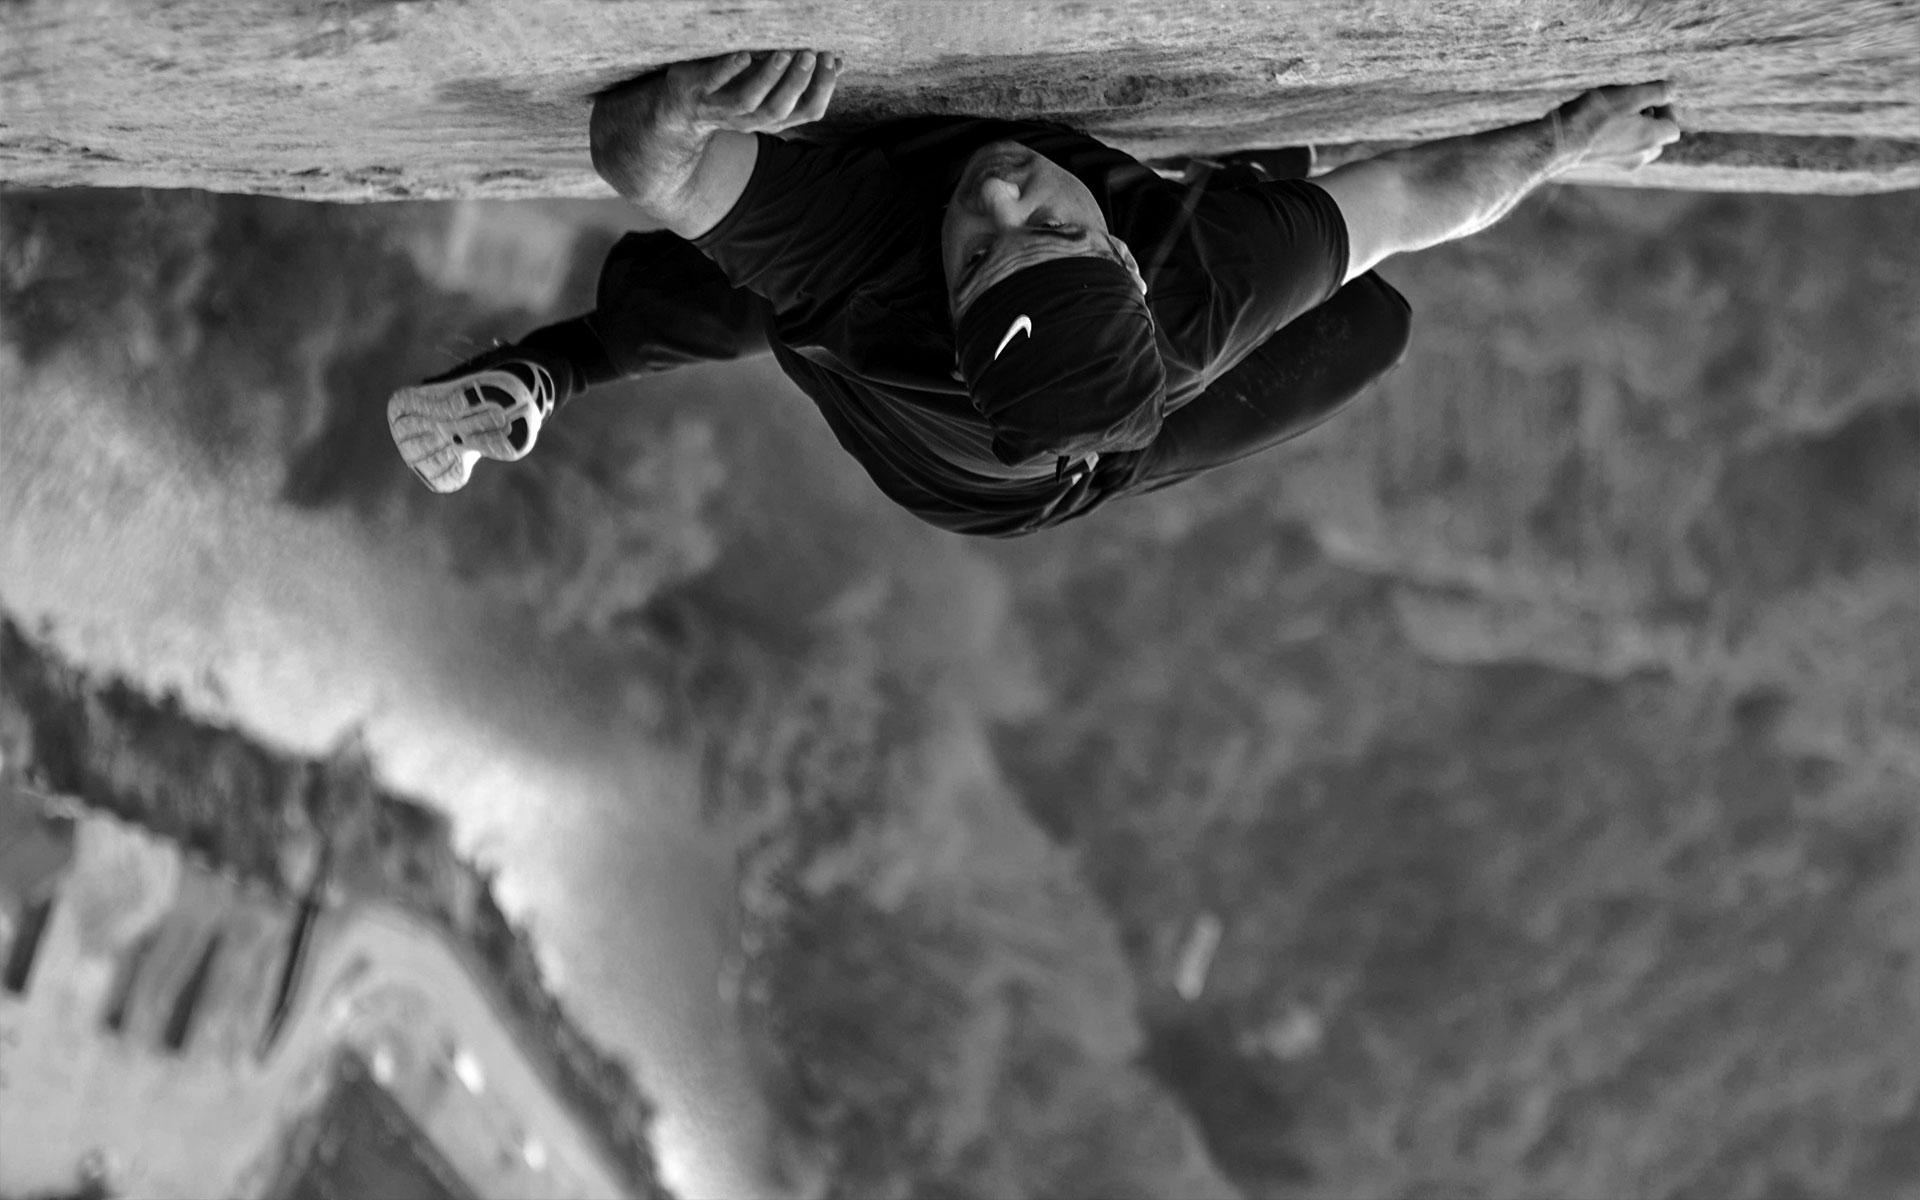 Or climb